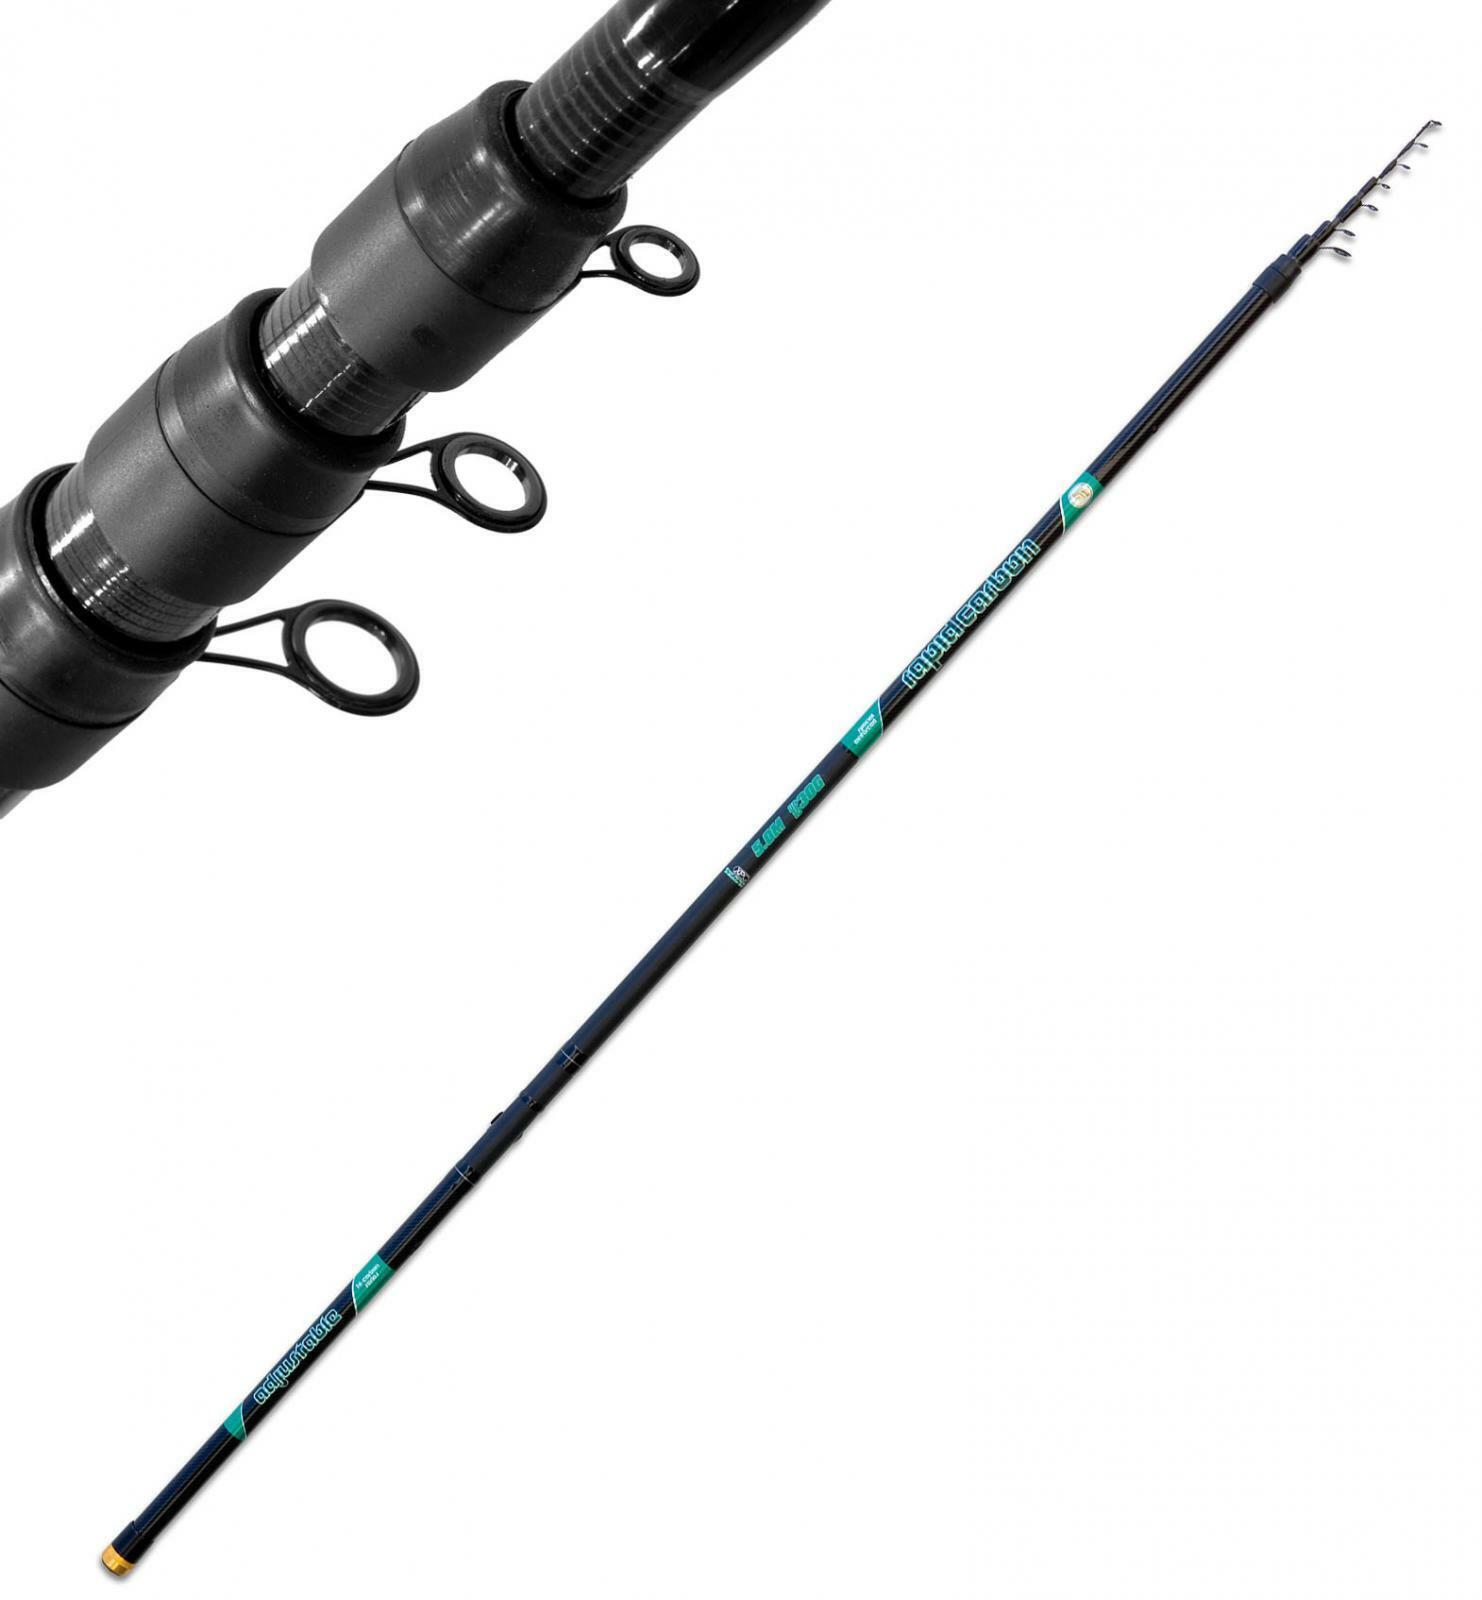 2605070 Canna pesca  Teleregolabile Cochebonio 7 mt Trojoa torrente anelli Sic FEU  tienda de bajo costo